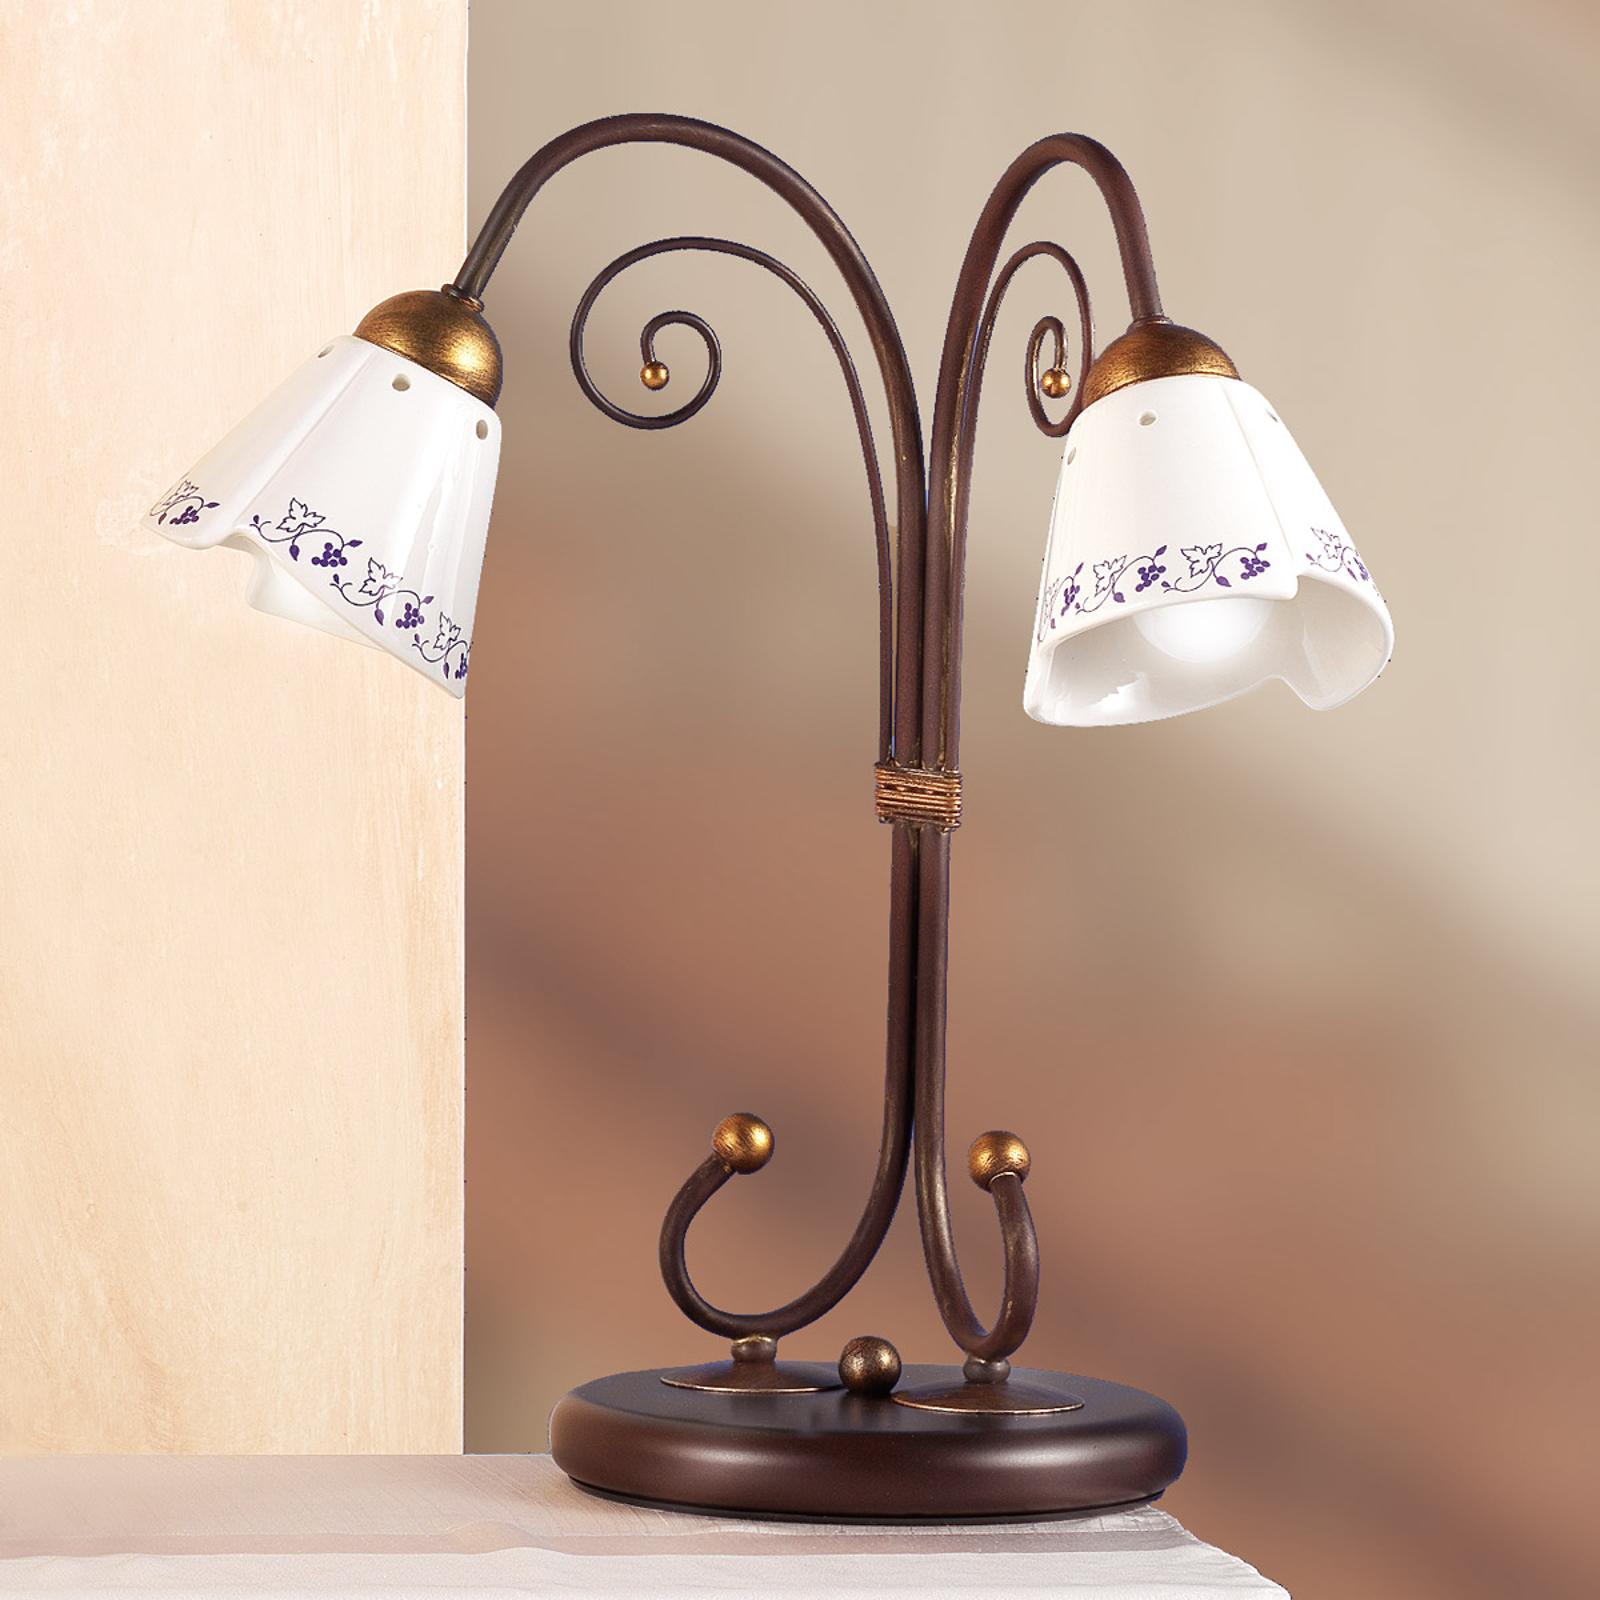 Stolná lampa Cartoccio 2-plameňová_2013043_1